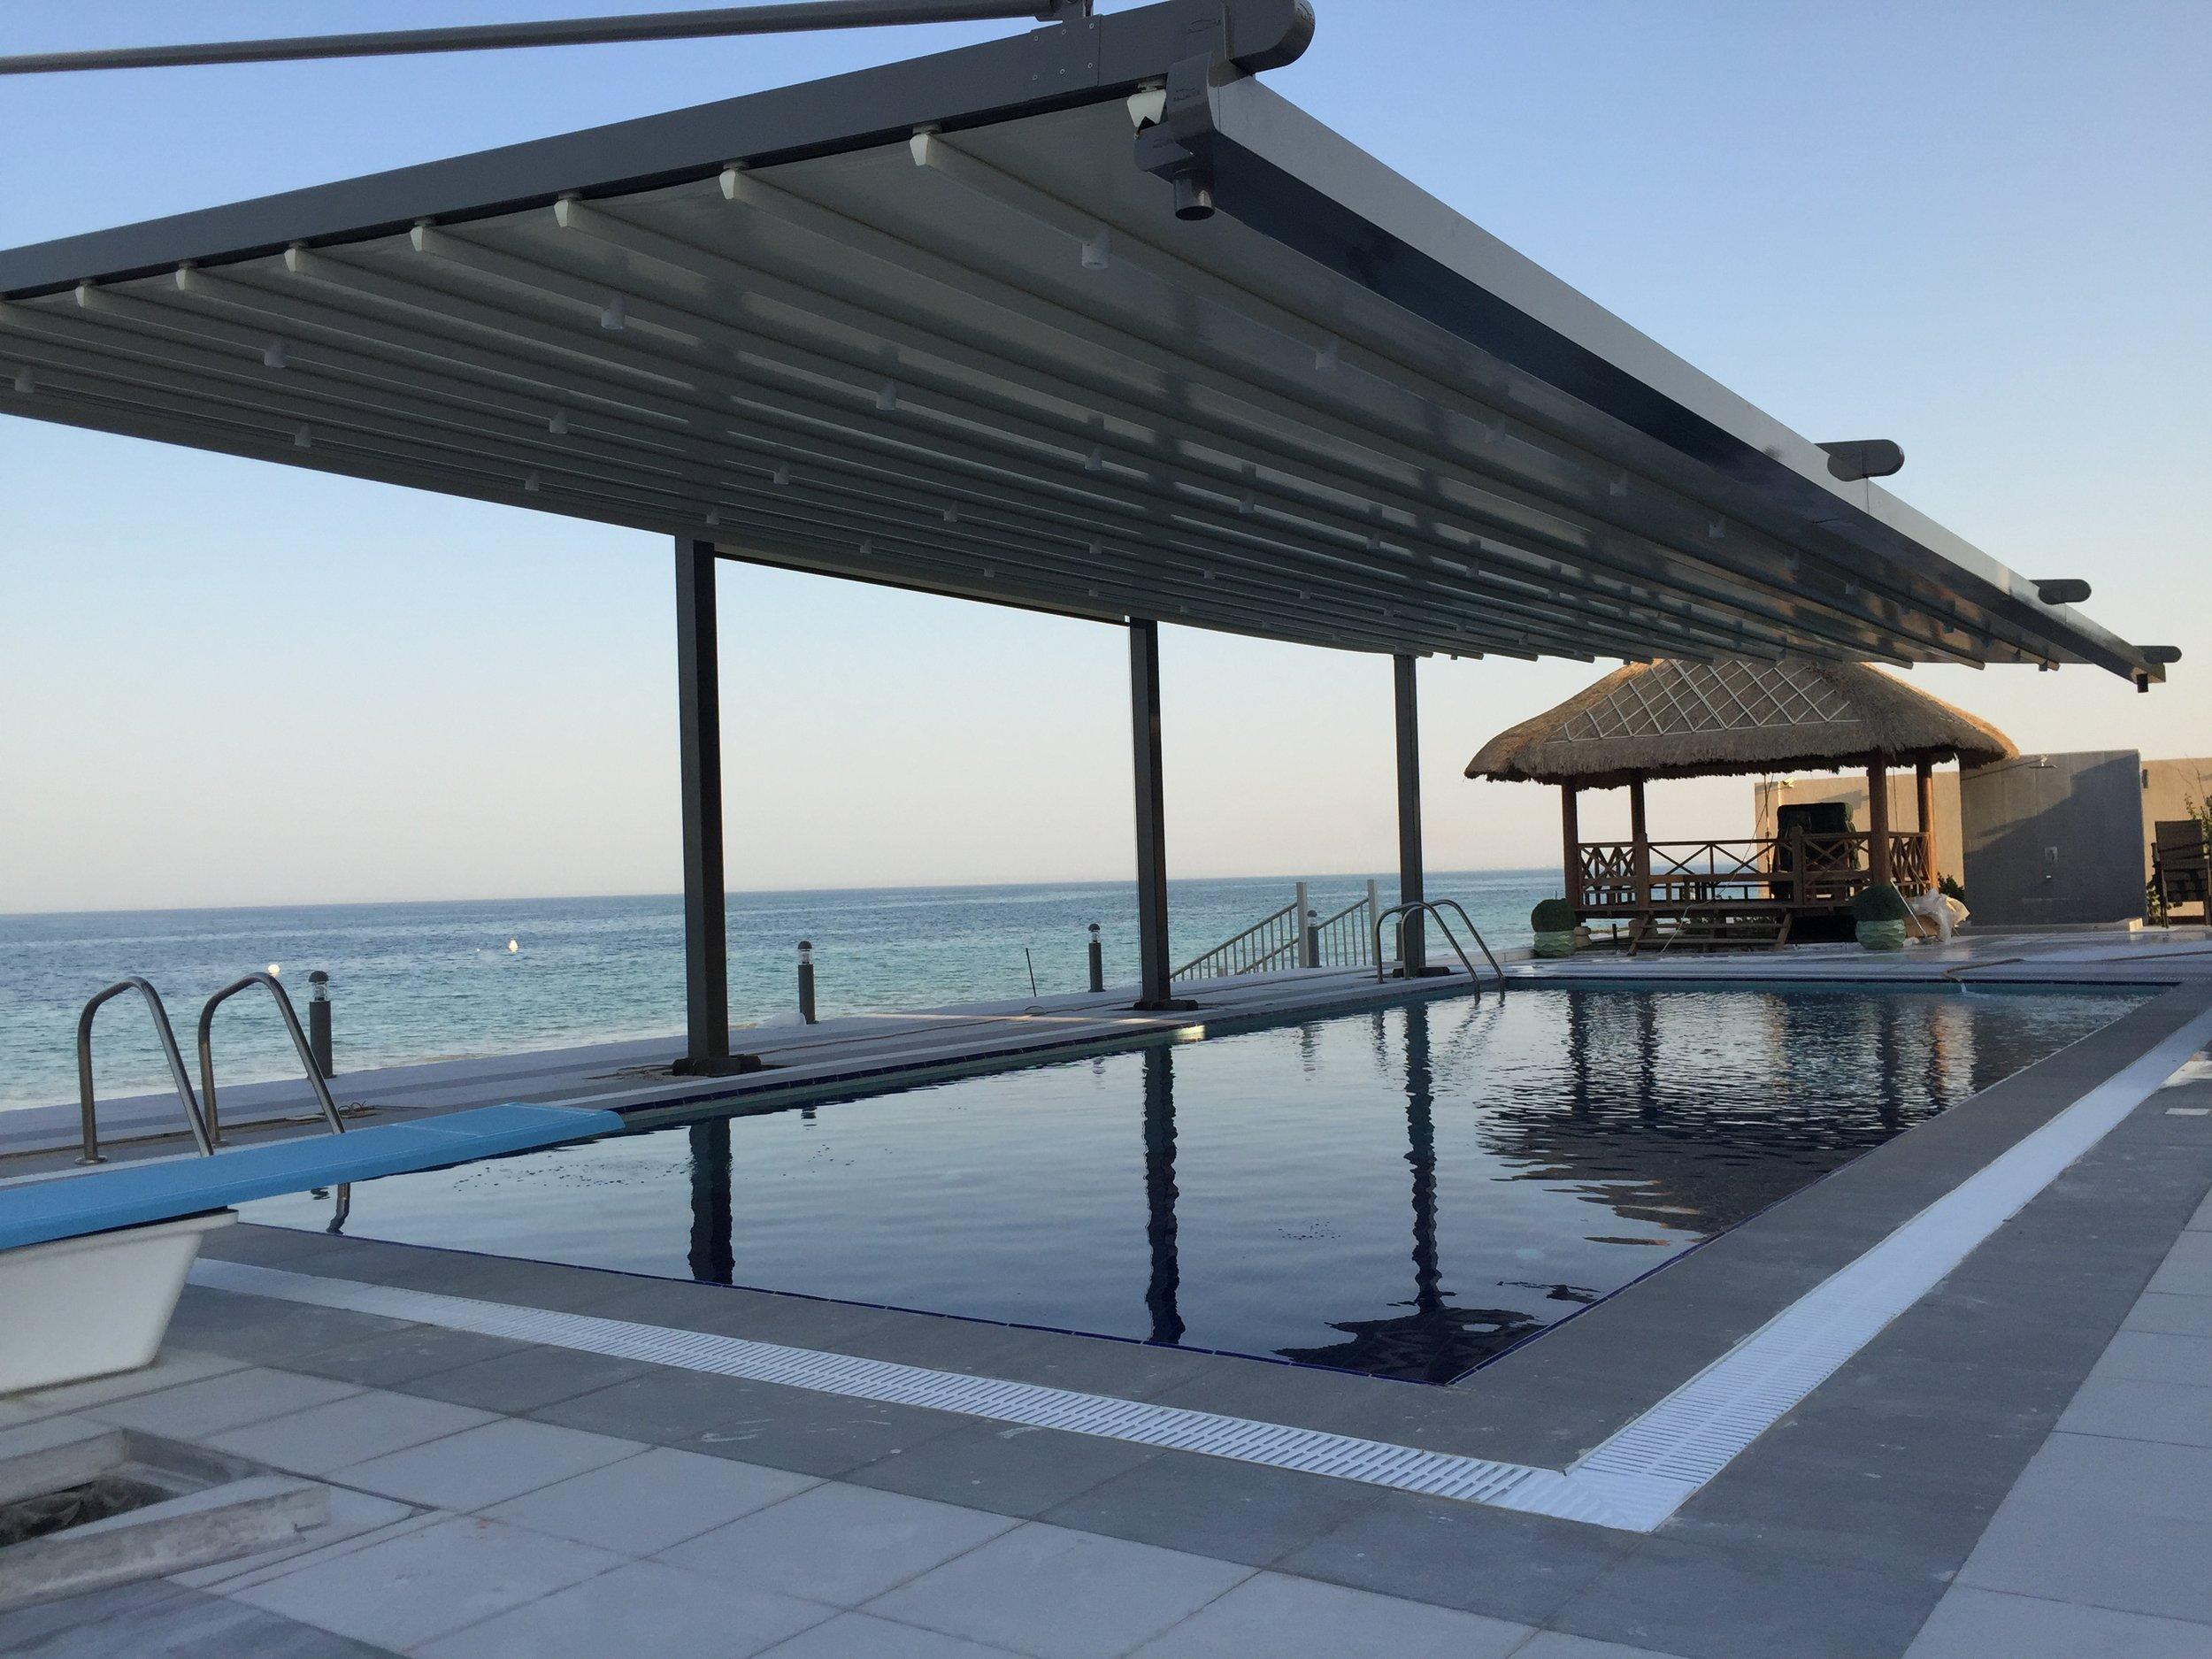 Pool Beach Chalet Bneider 2018-08-30_17-15-43.jpg